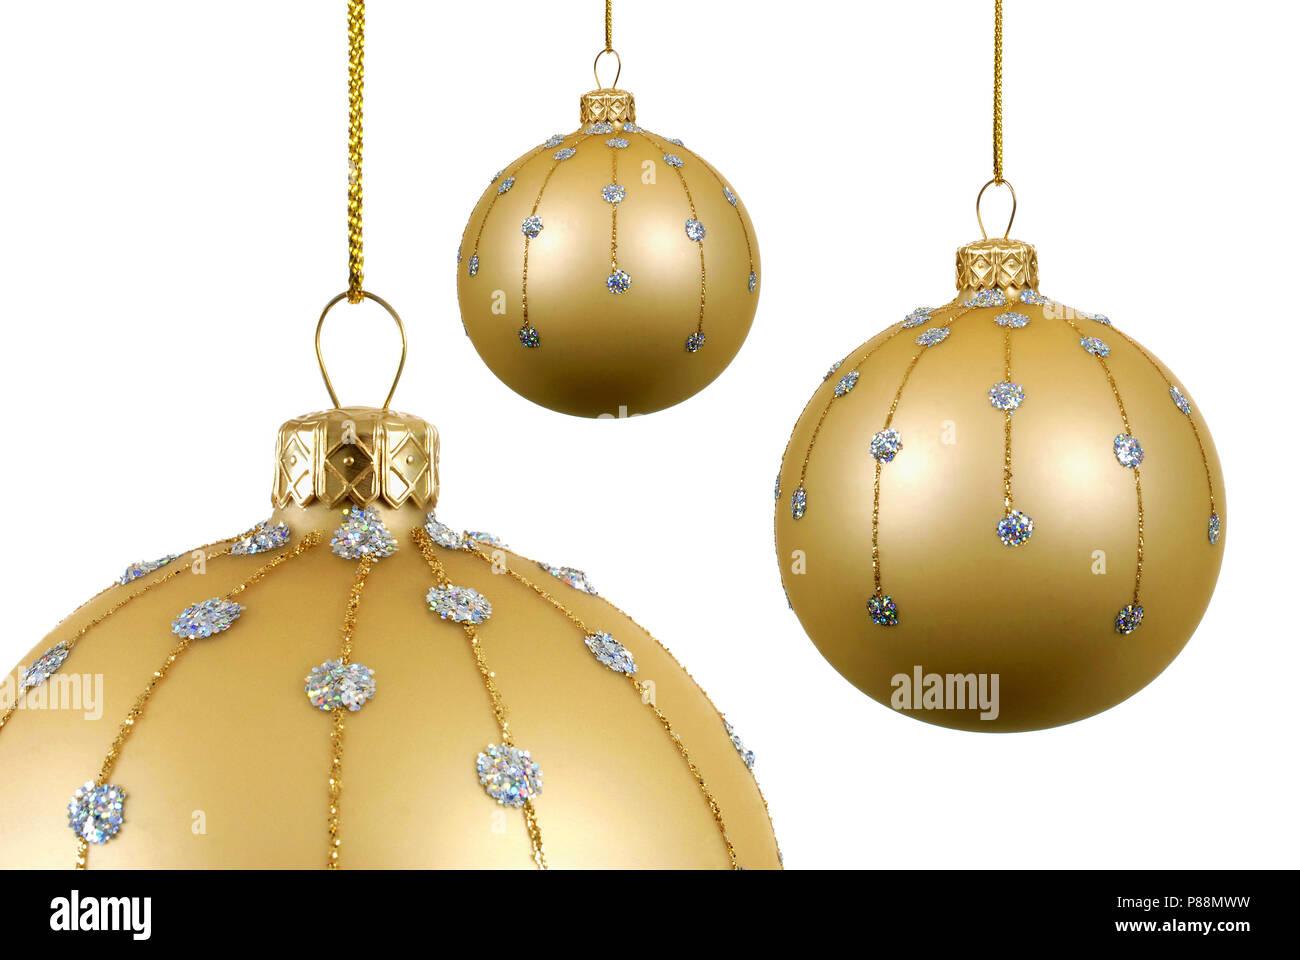 Christbaumkugeln Glas Gold.Mehrere Gold Weihnachtskugeln Oder Christbaumkugeln Aus Glas